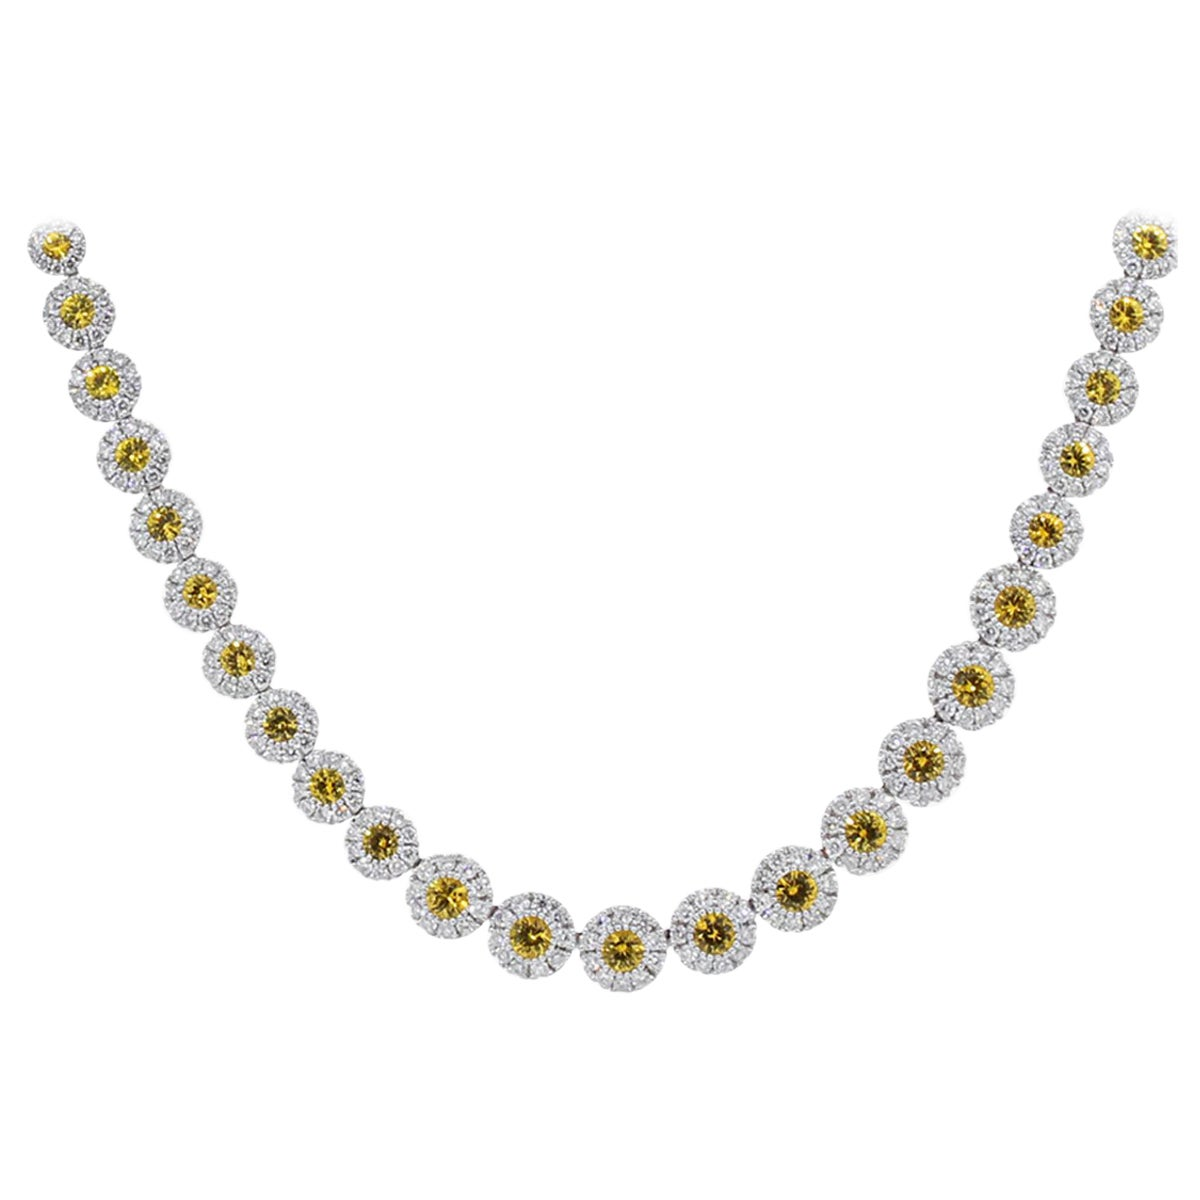 6.41 Carat Yellow Sapphire Necklace